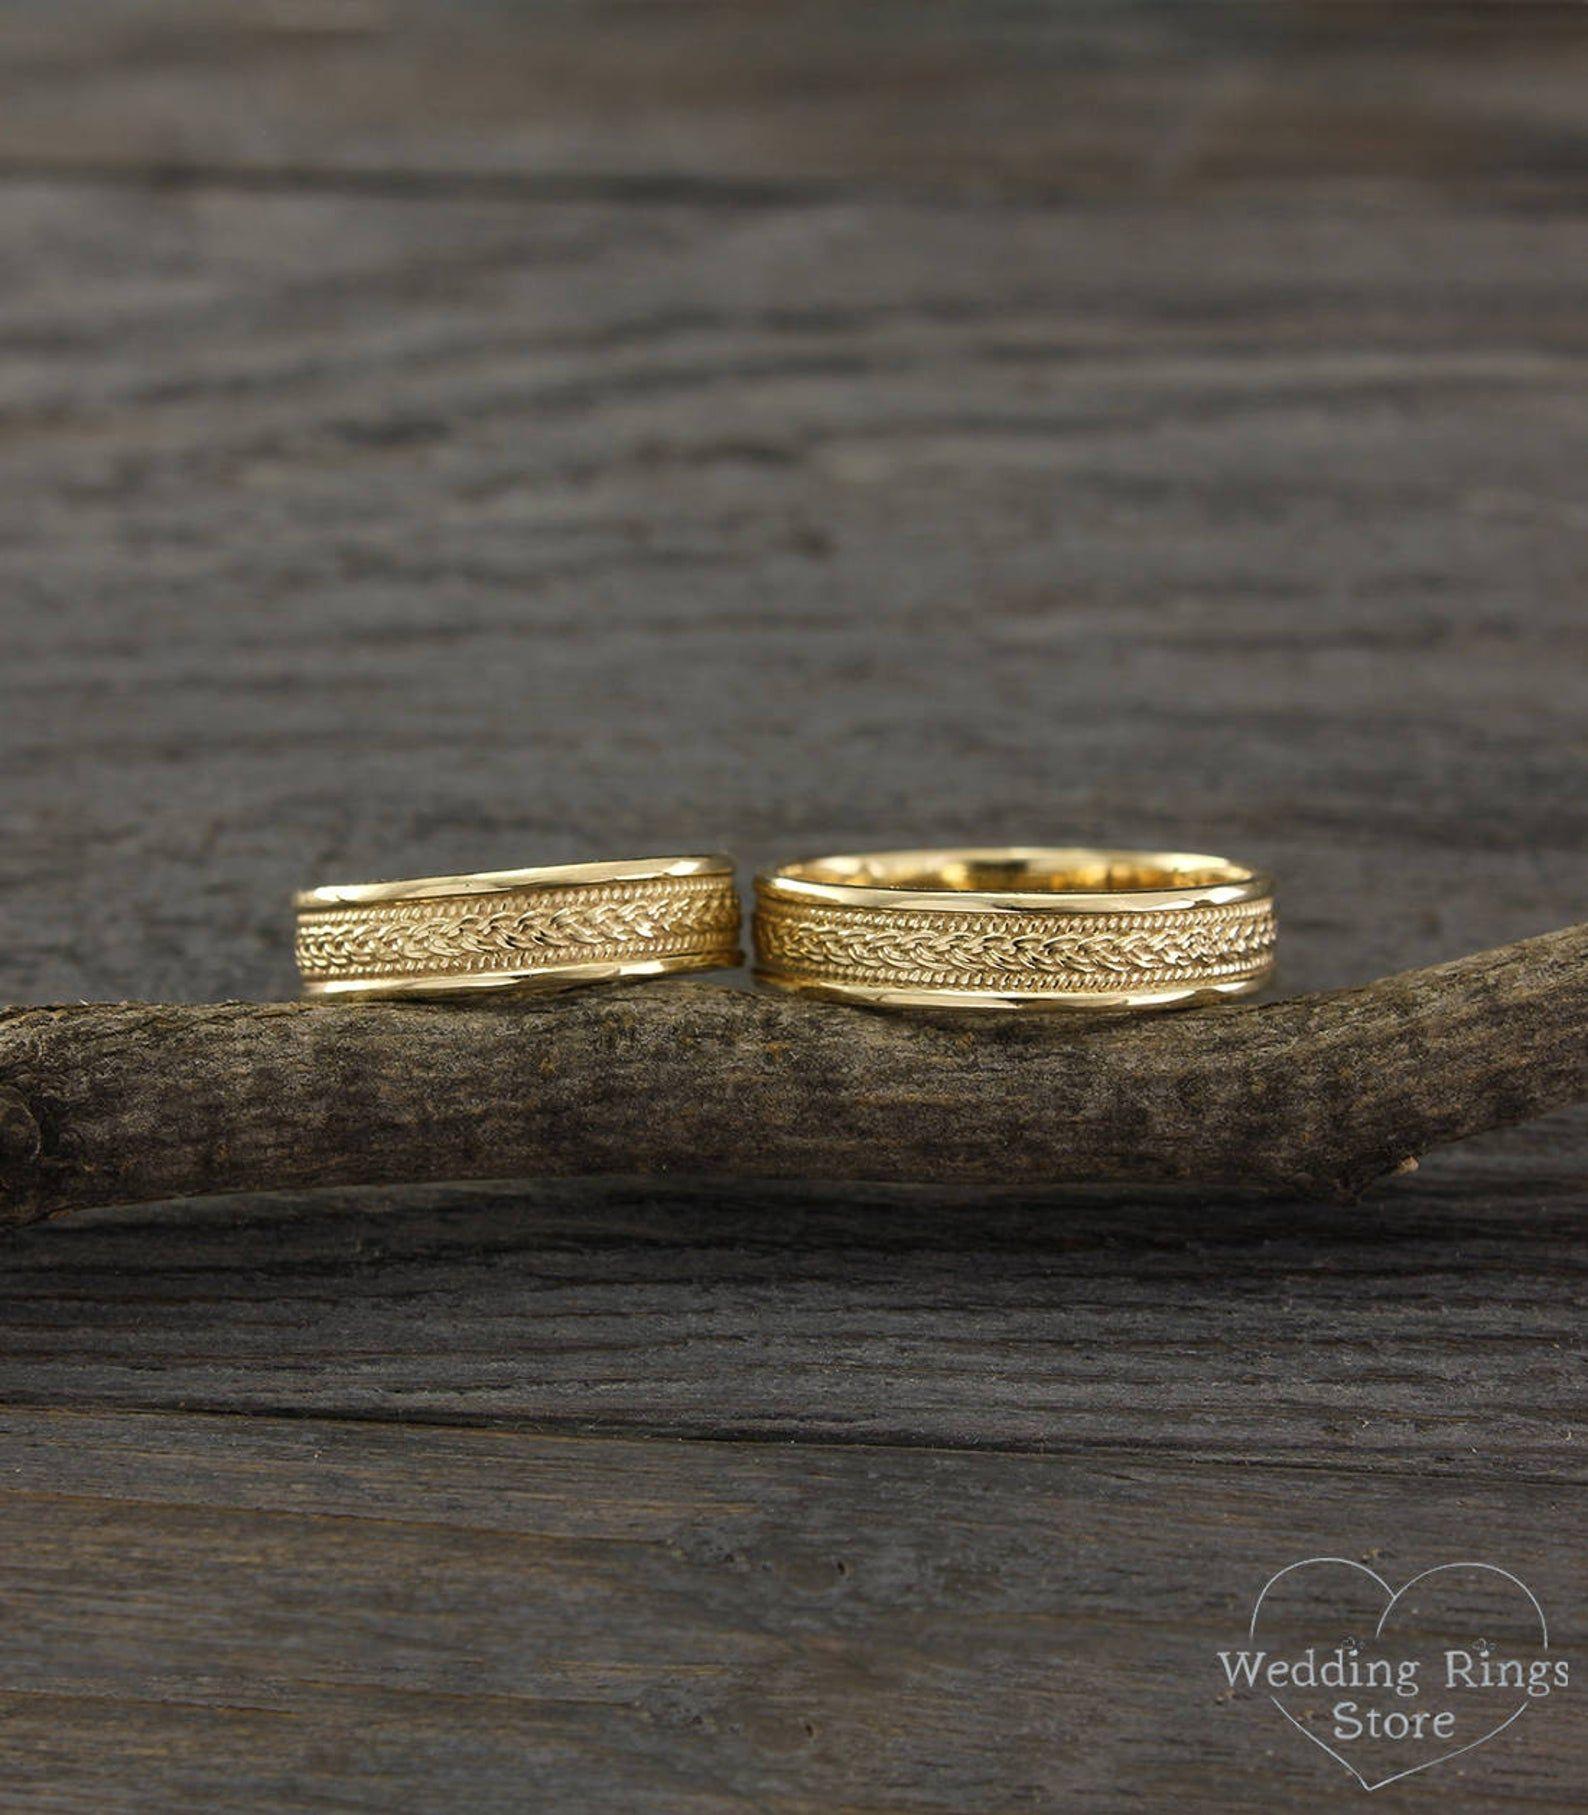 Braided wedding rings set Filigree wedding bands Unique